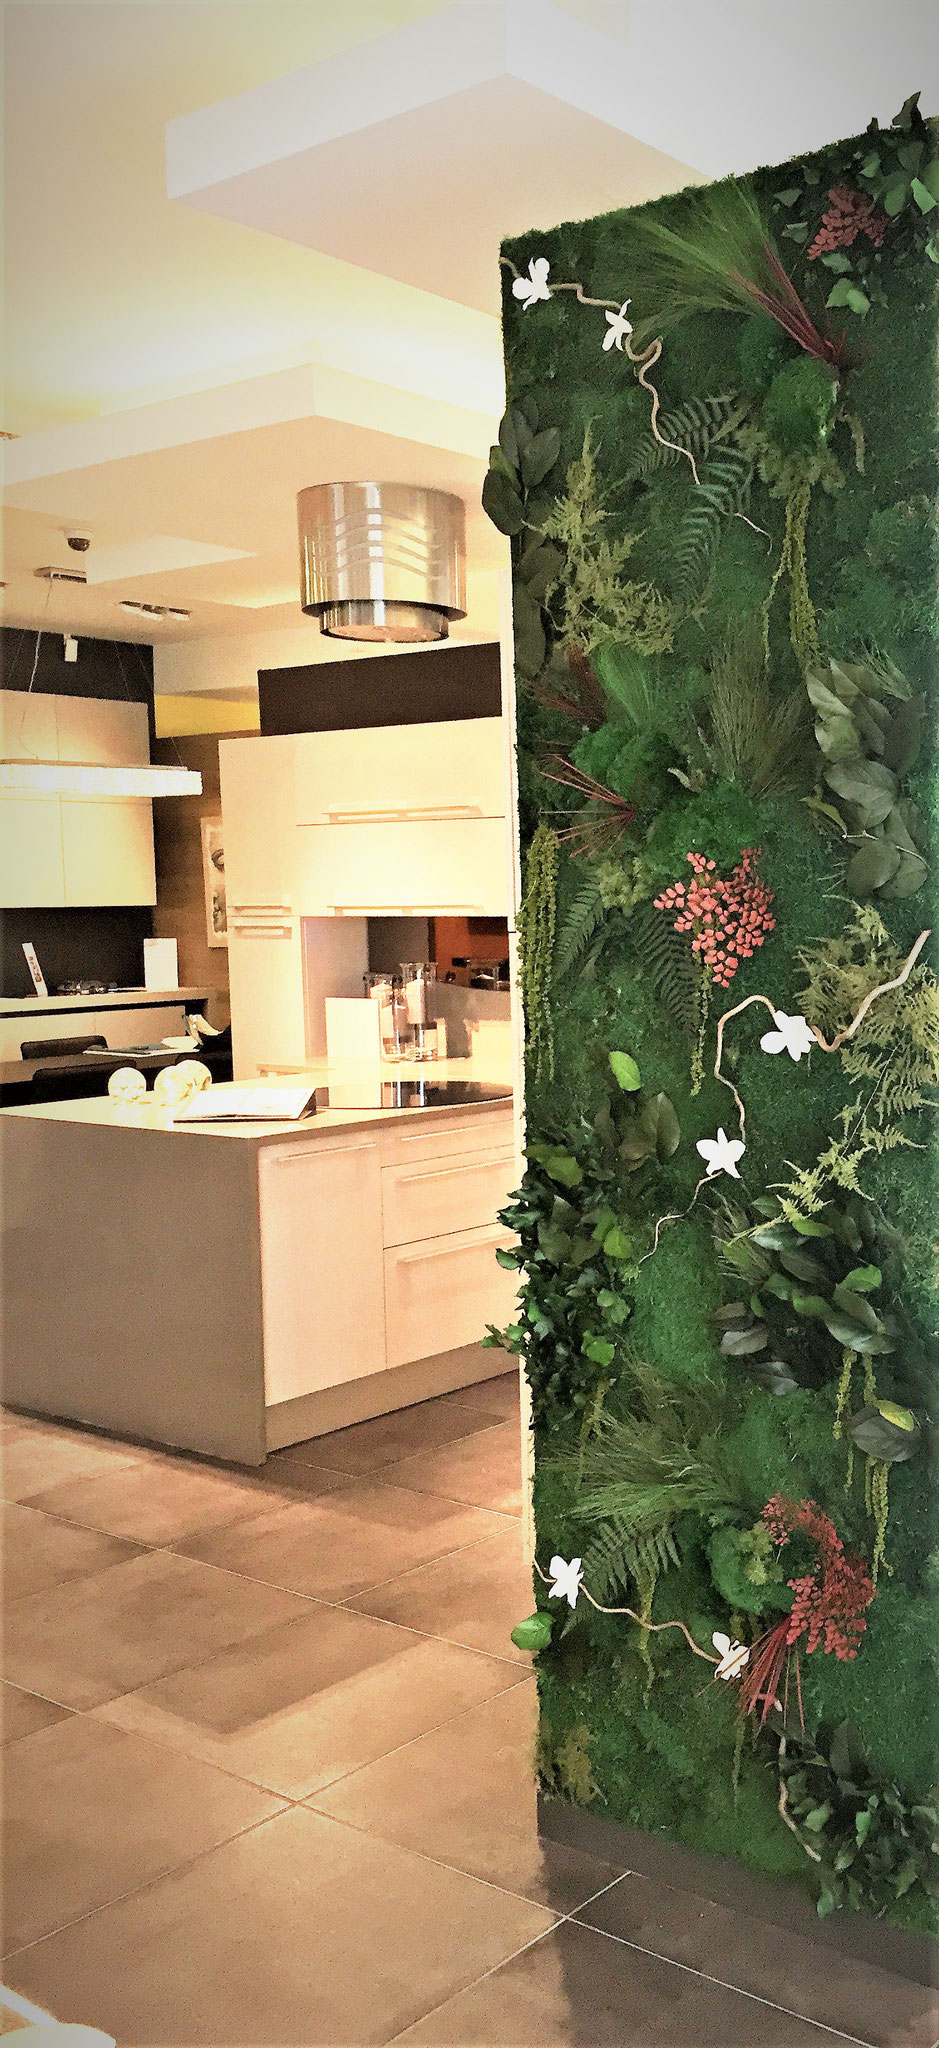 Magasin Cuisine De France Centre Commercial L Atoll Angers